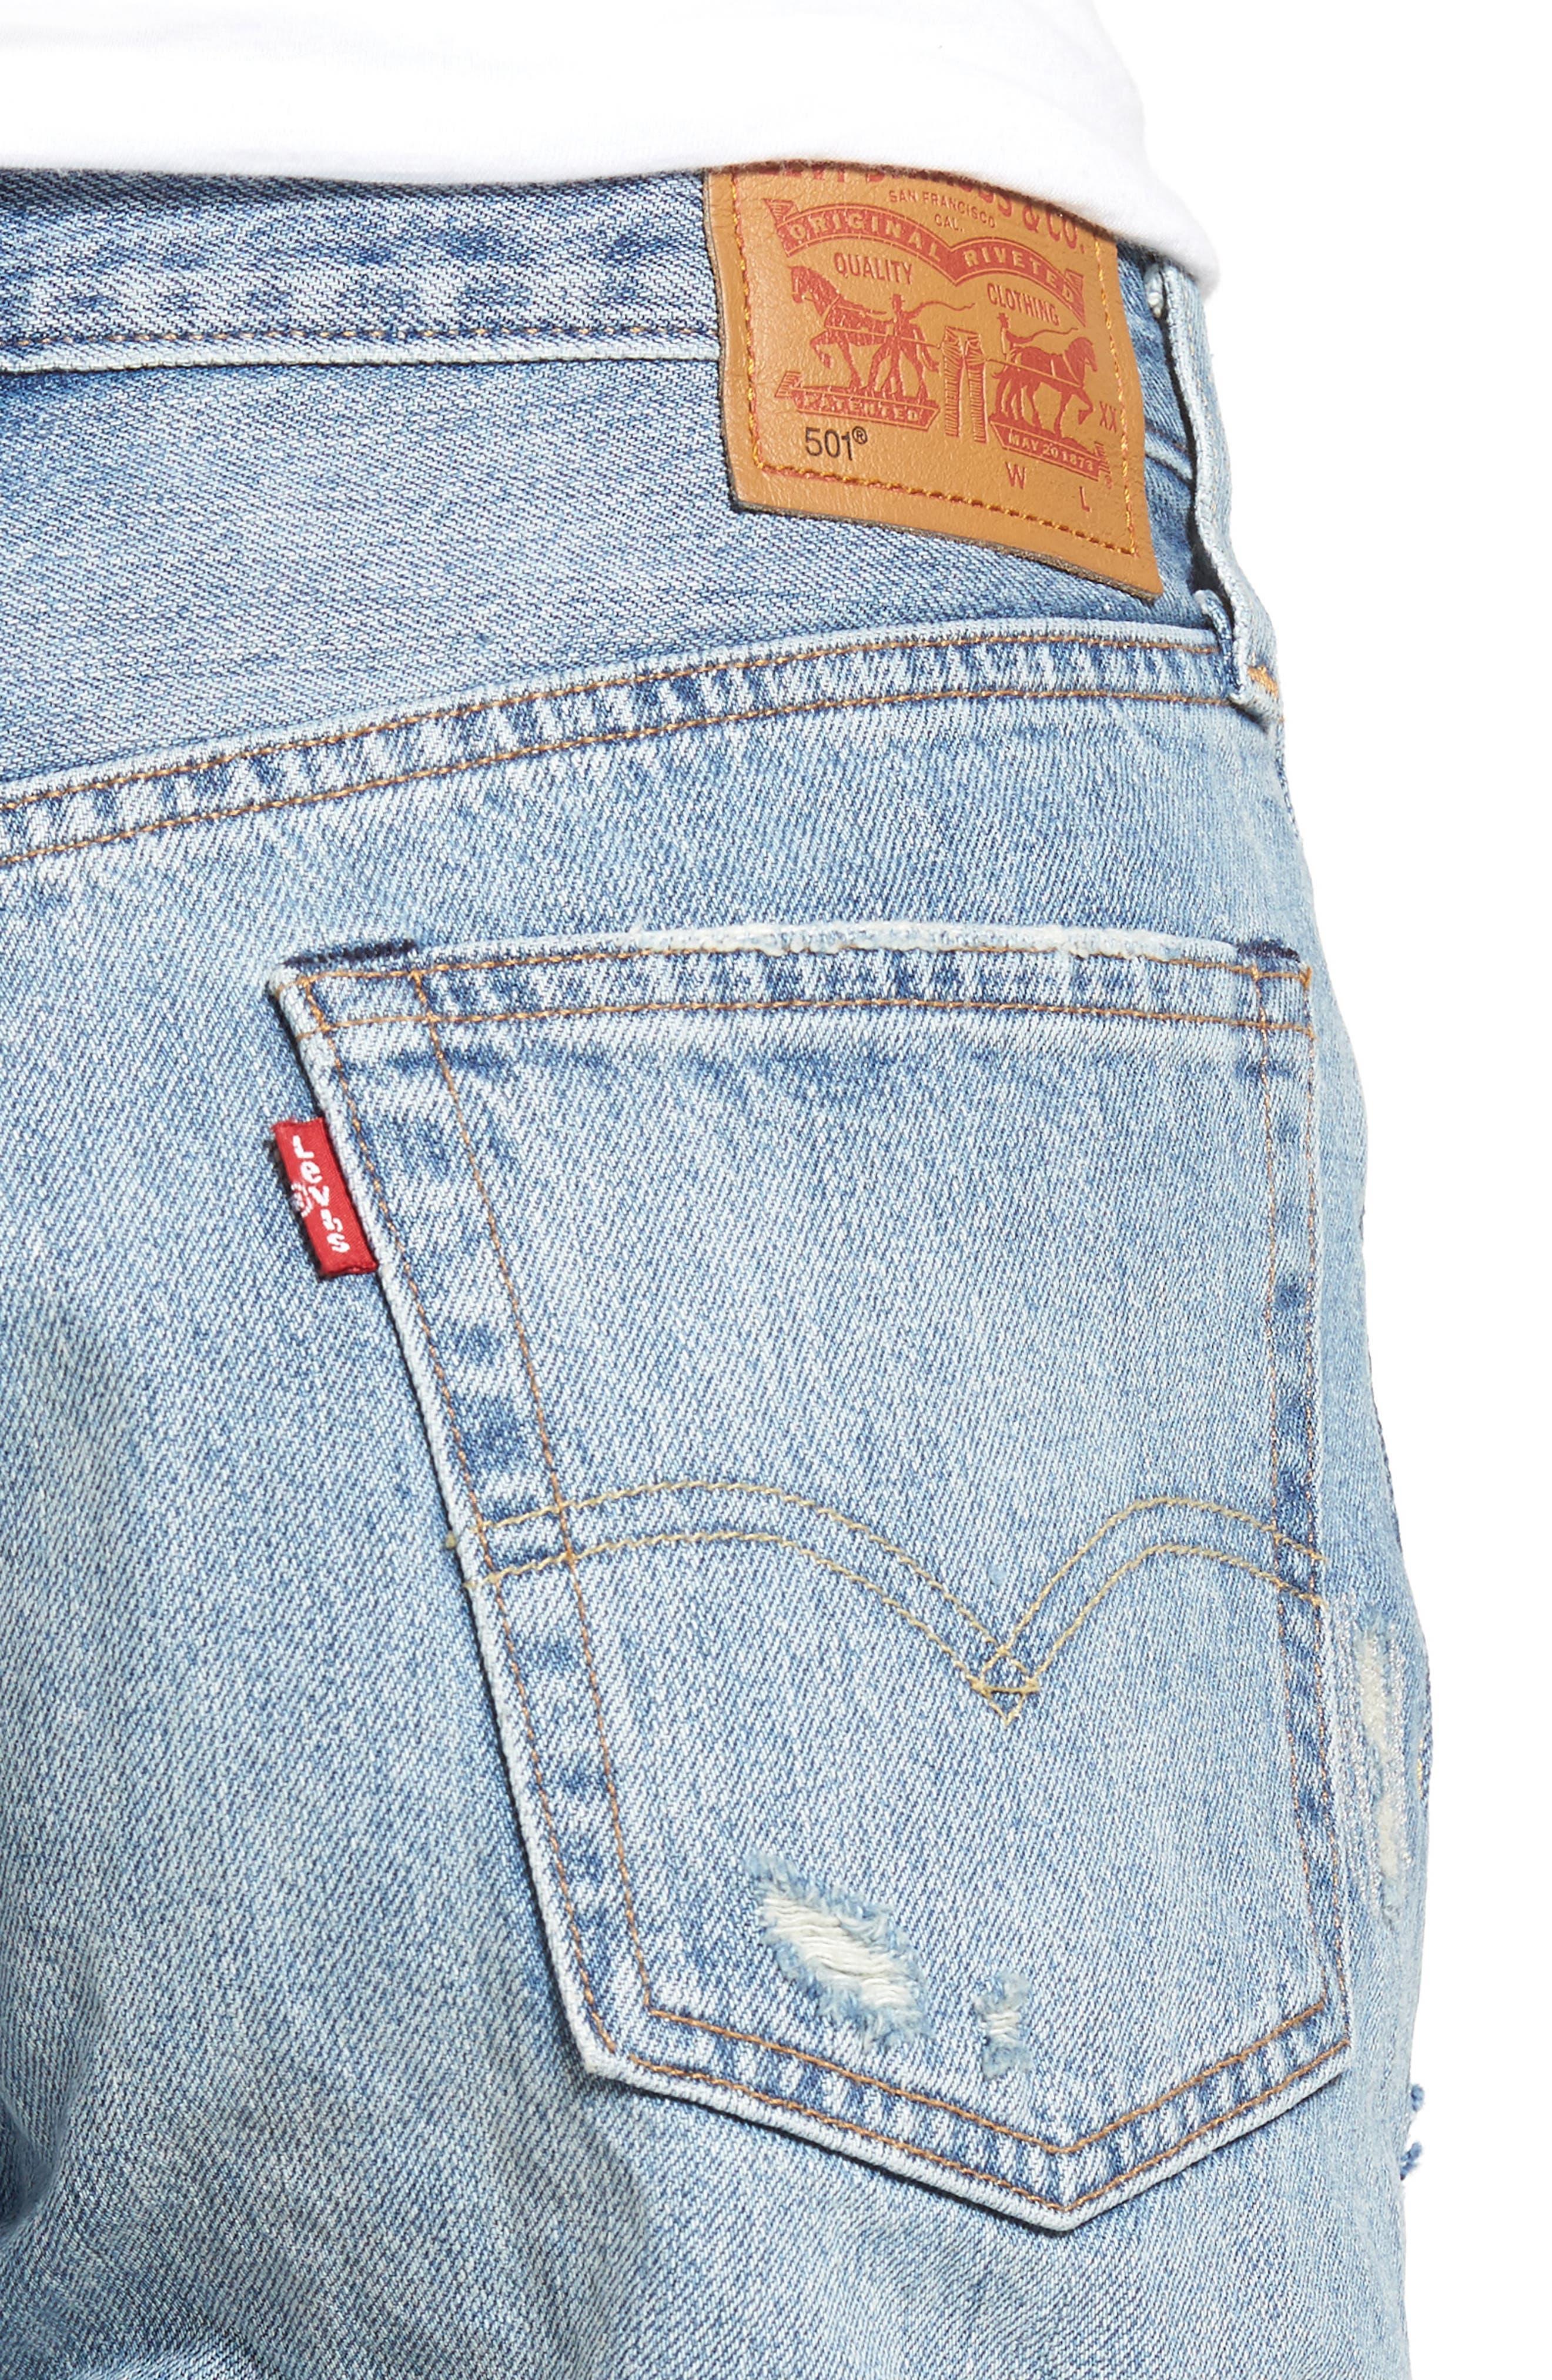 501 Long Denim Shorts,                             Alternate thumbnail 4, color,                             400